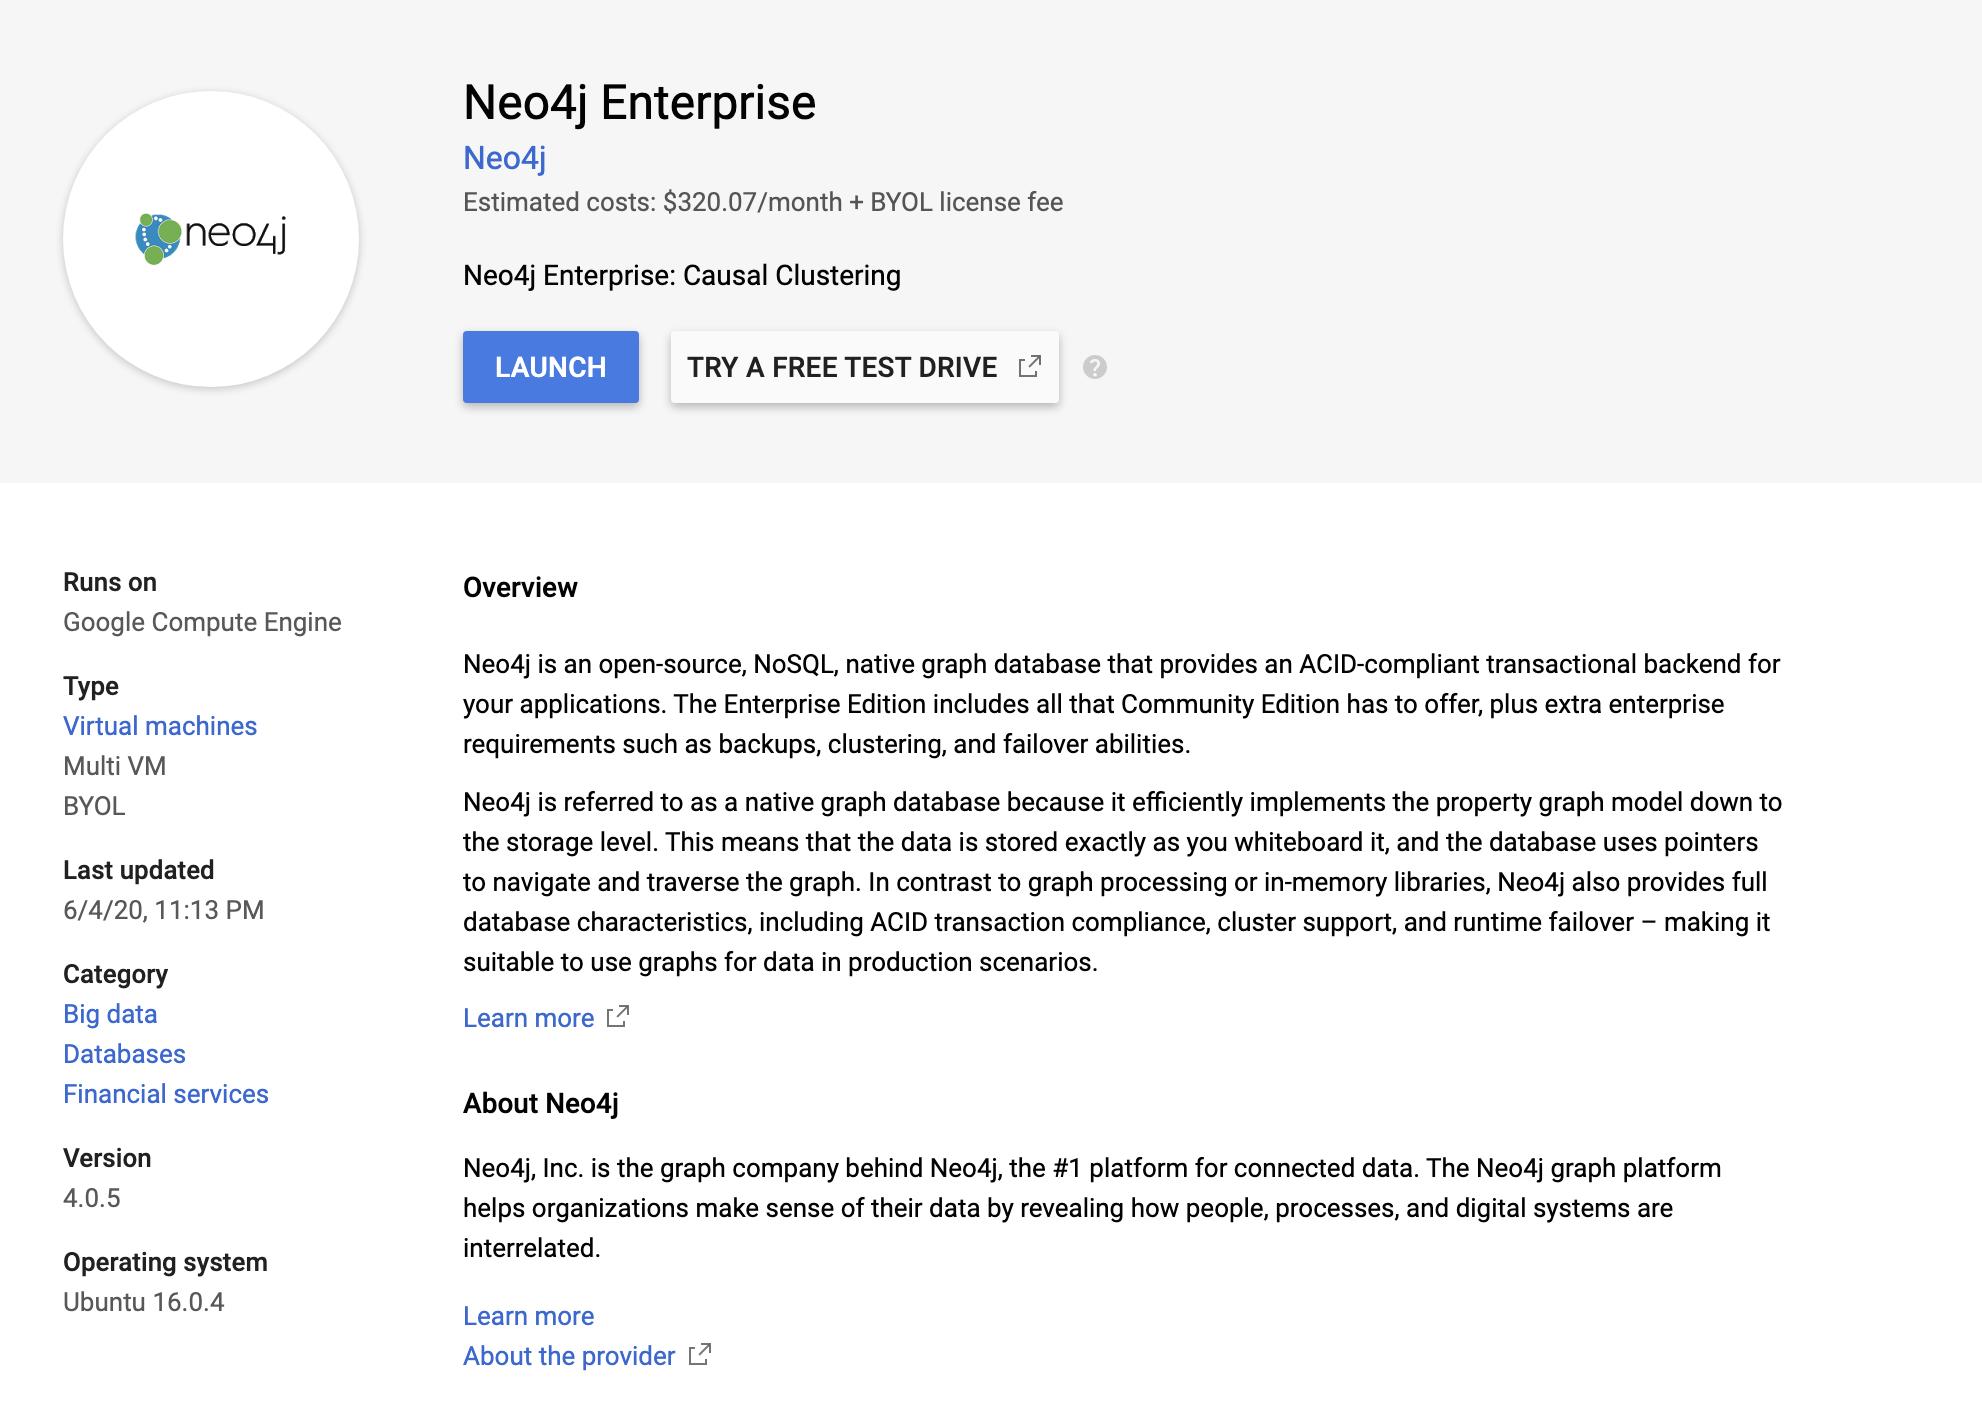 Neo4j on GCP Marketplace - Neo4j Graph Database Platform